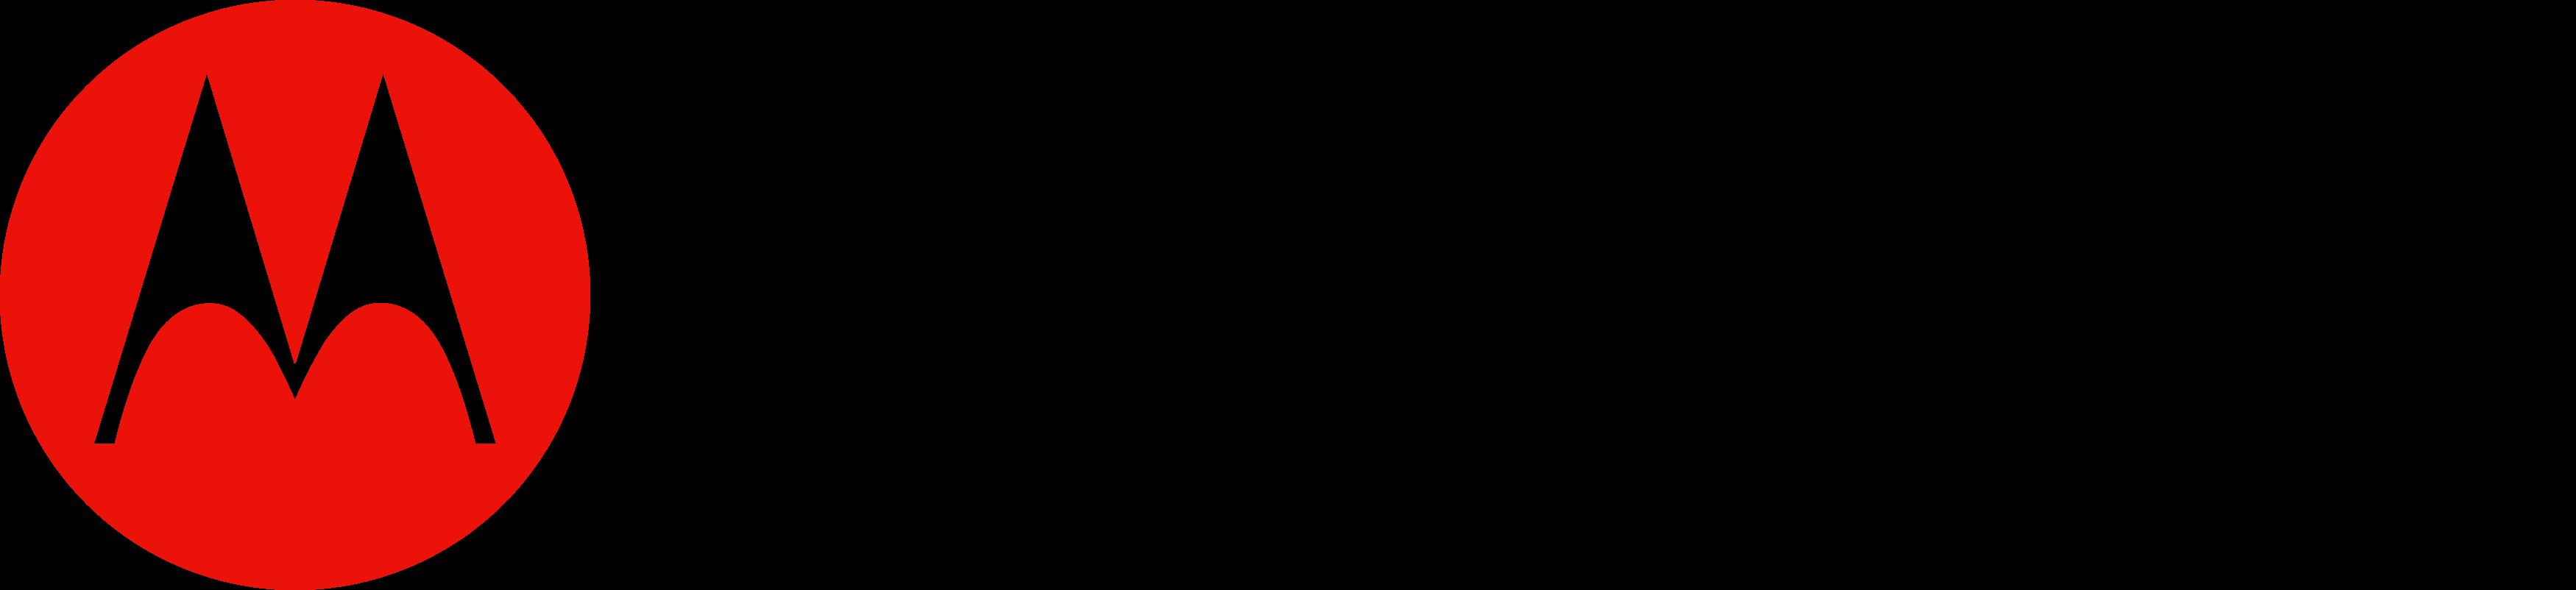 motorola logo 1 - Motorola Logo